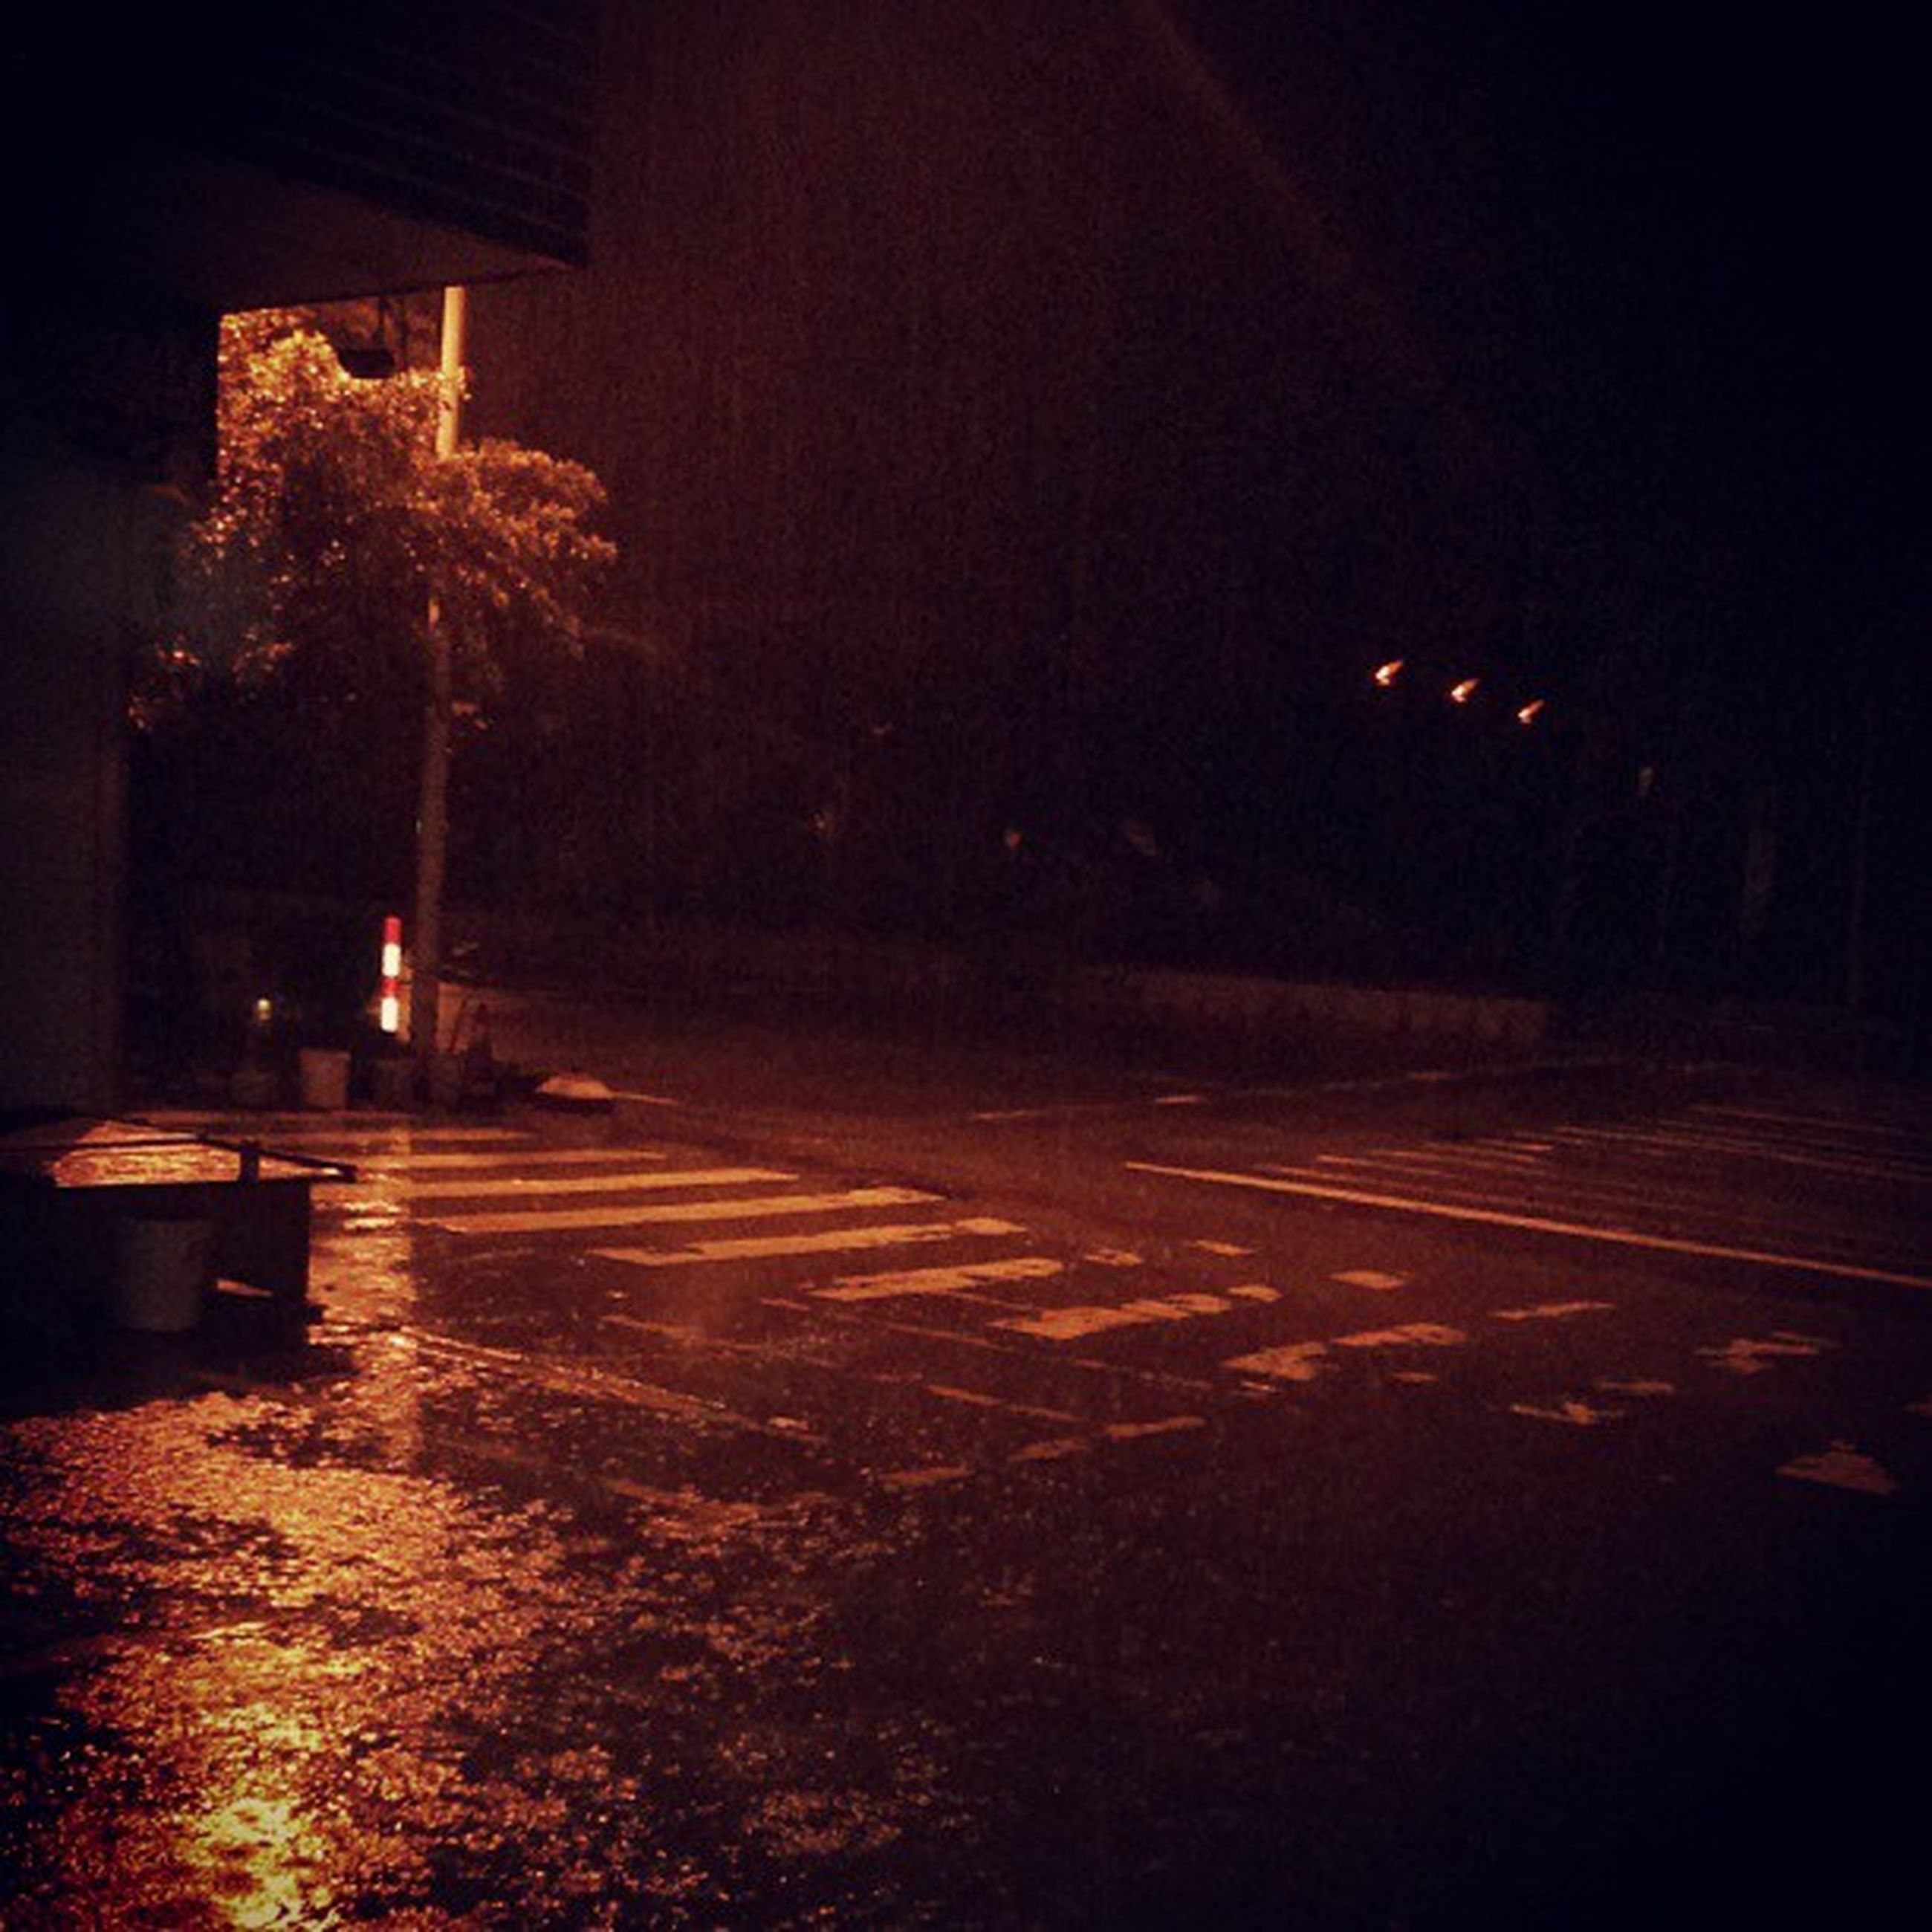 night, illuminated, street light, street, road, tree, lighting equipment, transportation, the way forward, dark, outdoors, building exterior, car, no people, light - natural phenomenon, silhouette, sky, light trail, city, road marking